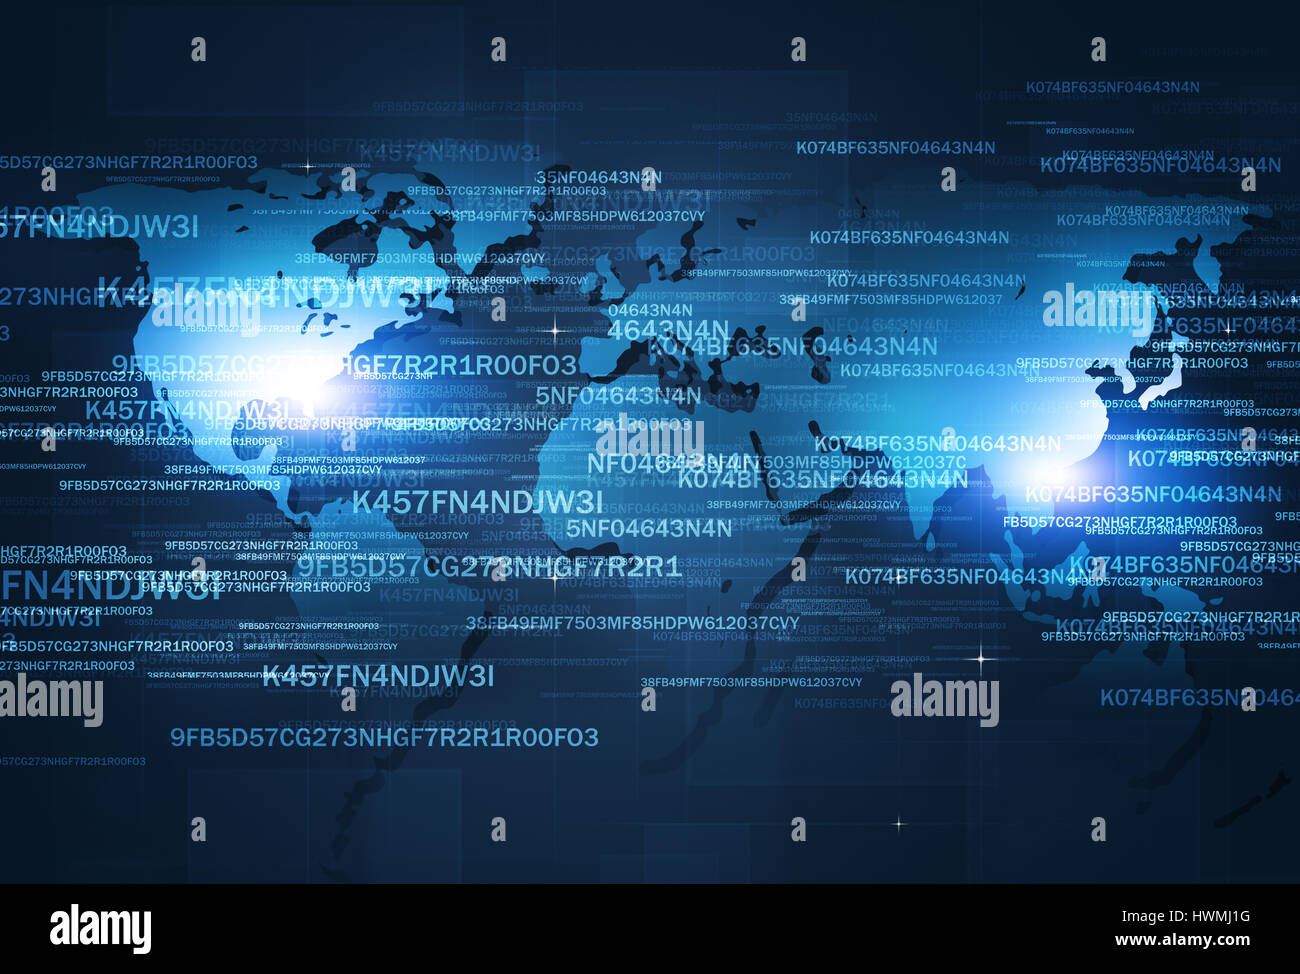 digital coding concept technology internet security blue background - Stock Image